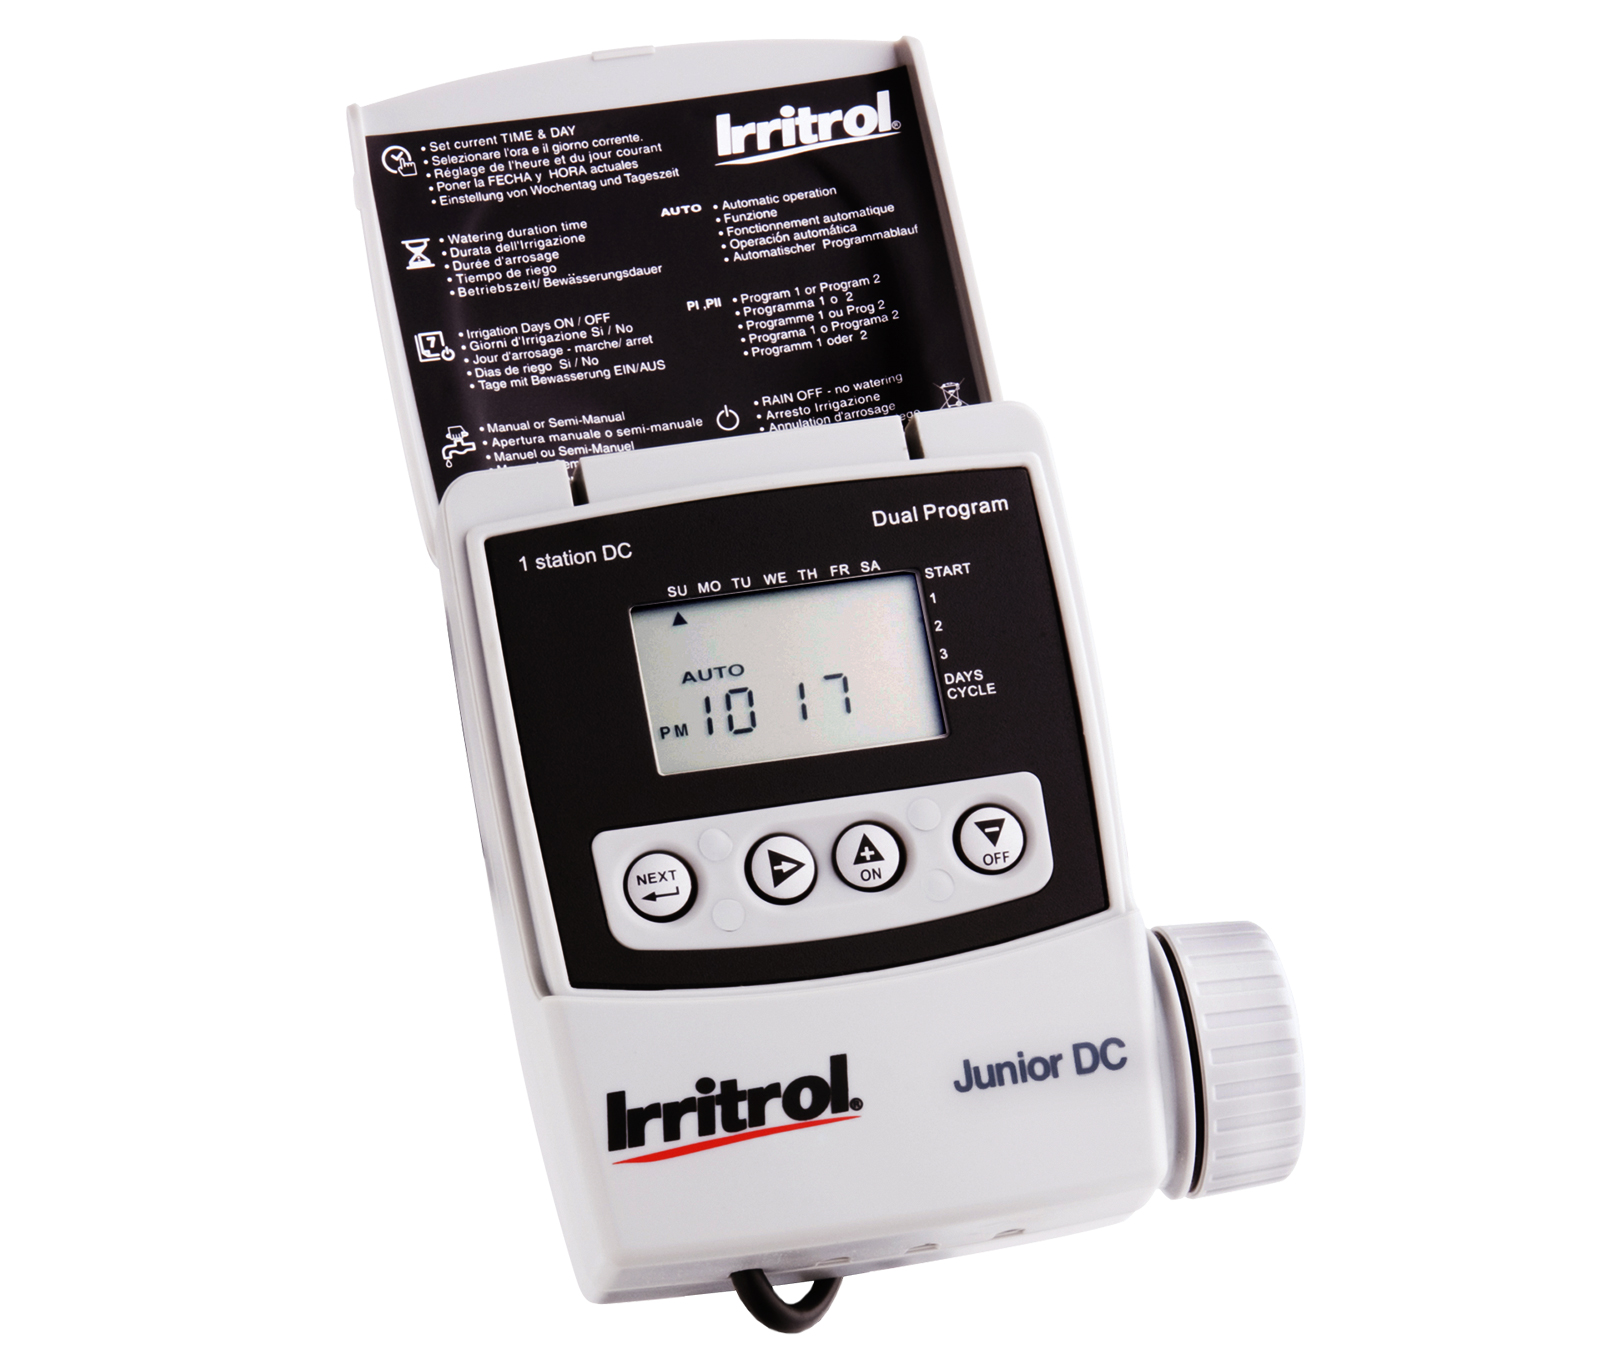 junior_dc_studio.ashx?mw=700&mh=599&hash=4FF403A9149FD0C6330934FF740AC0C8470977E2 irritrol junior dc series irritrol rd-900 wiring diagram at bakdesigns.co